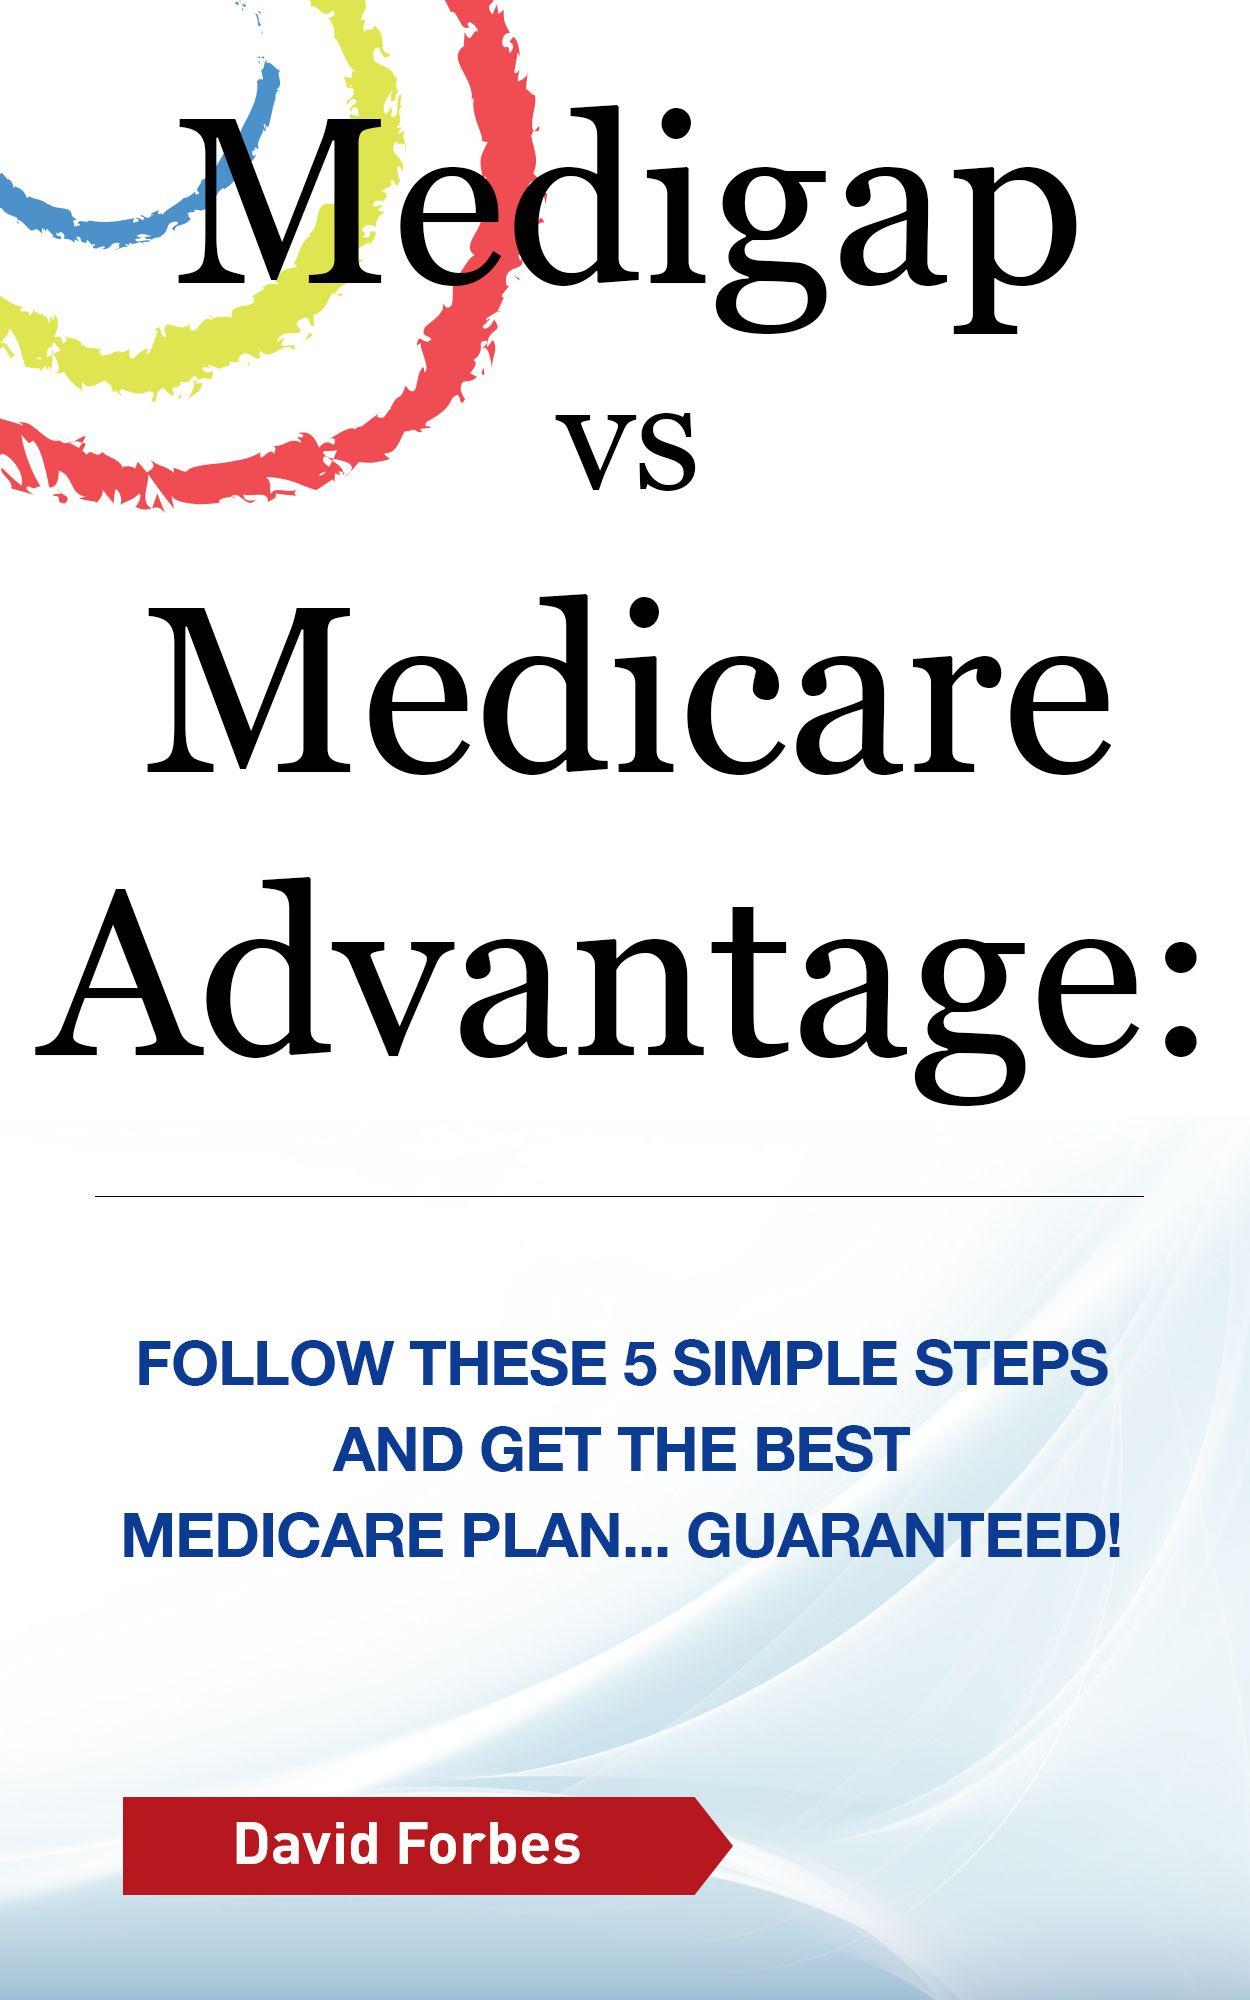 Medigap vs Medicare Advantage eBook